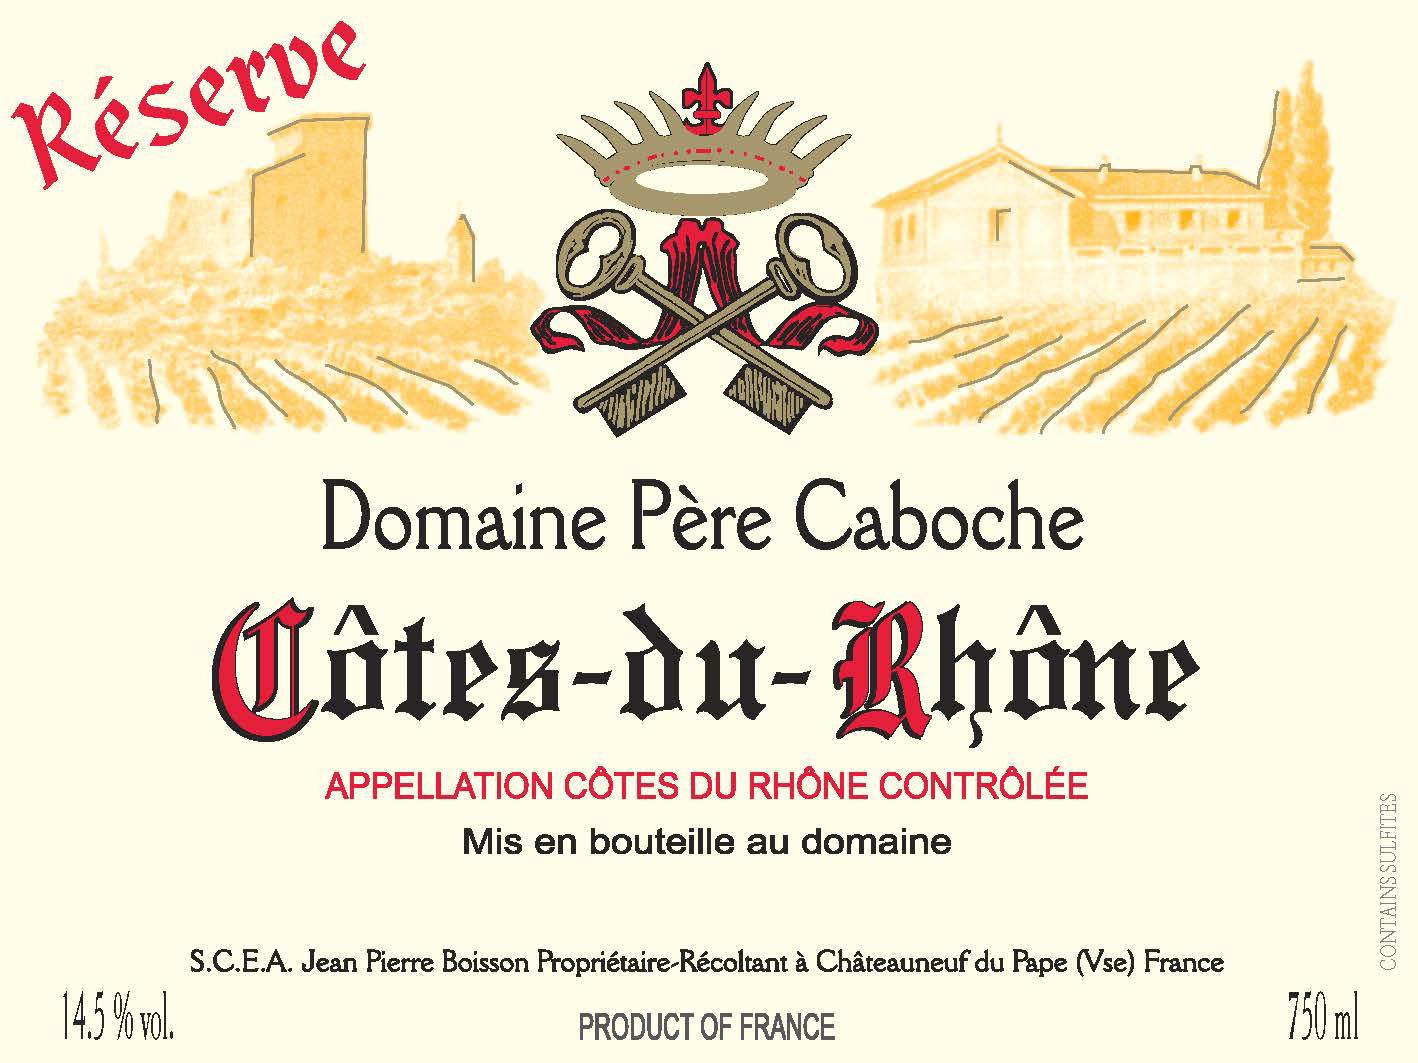 Domaine Pere Caboche- Cotes-du-Rhone- Reserve- Red label